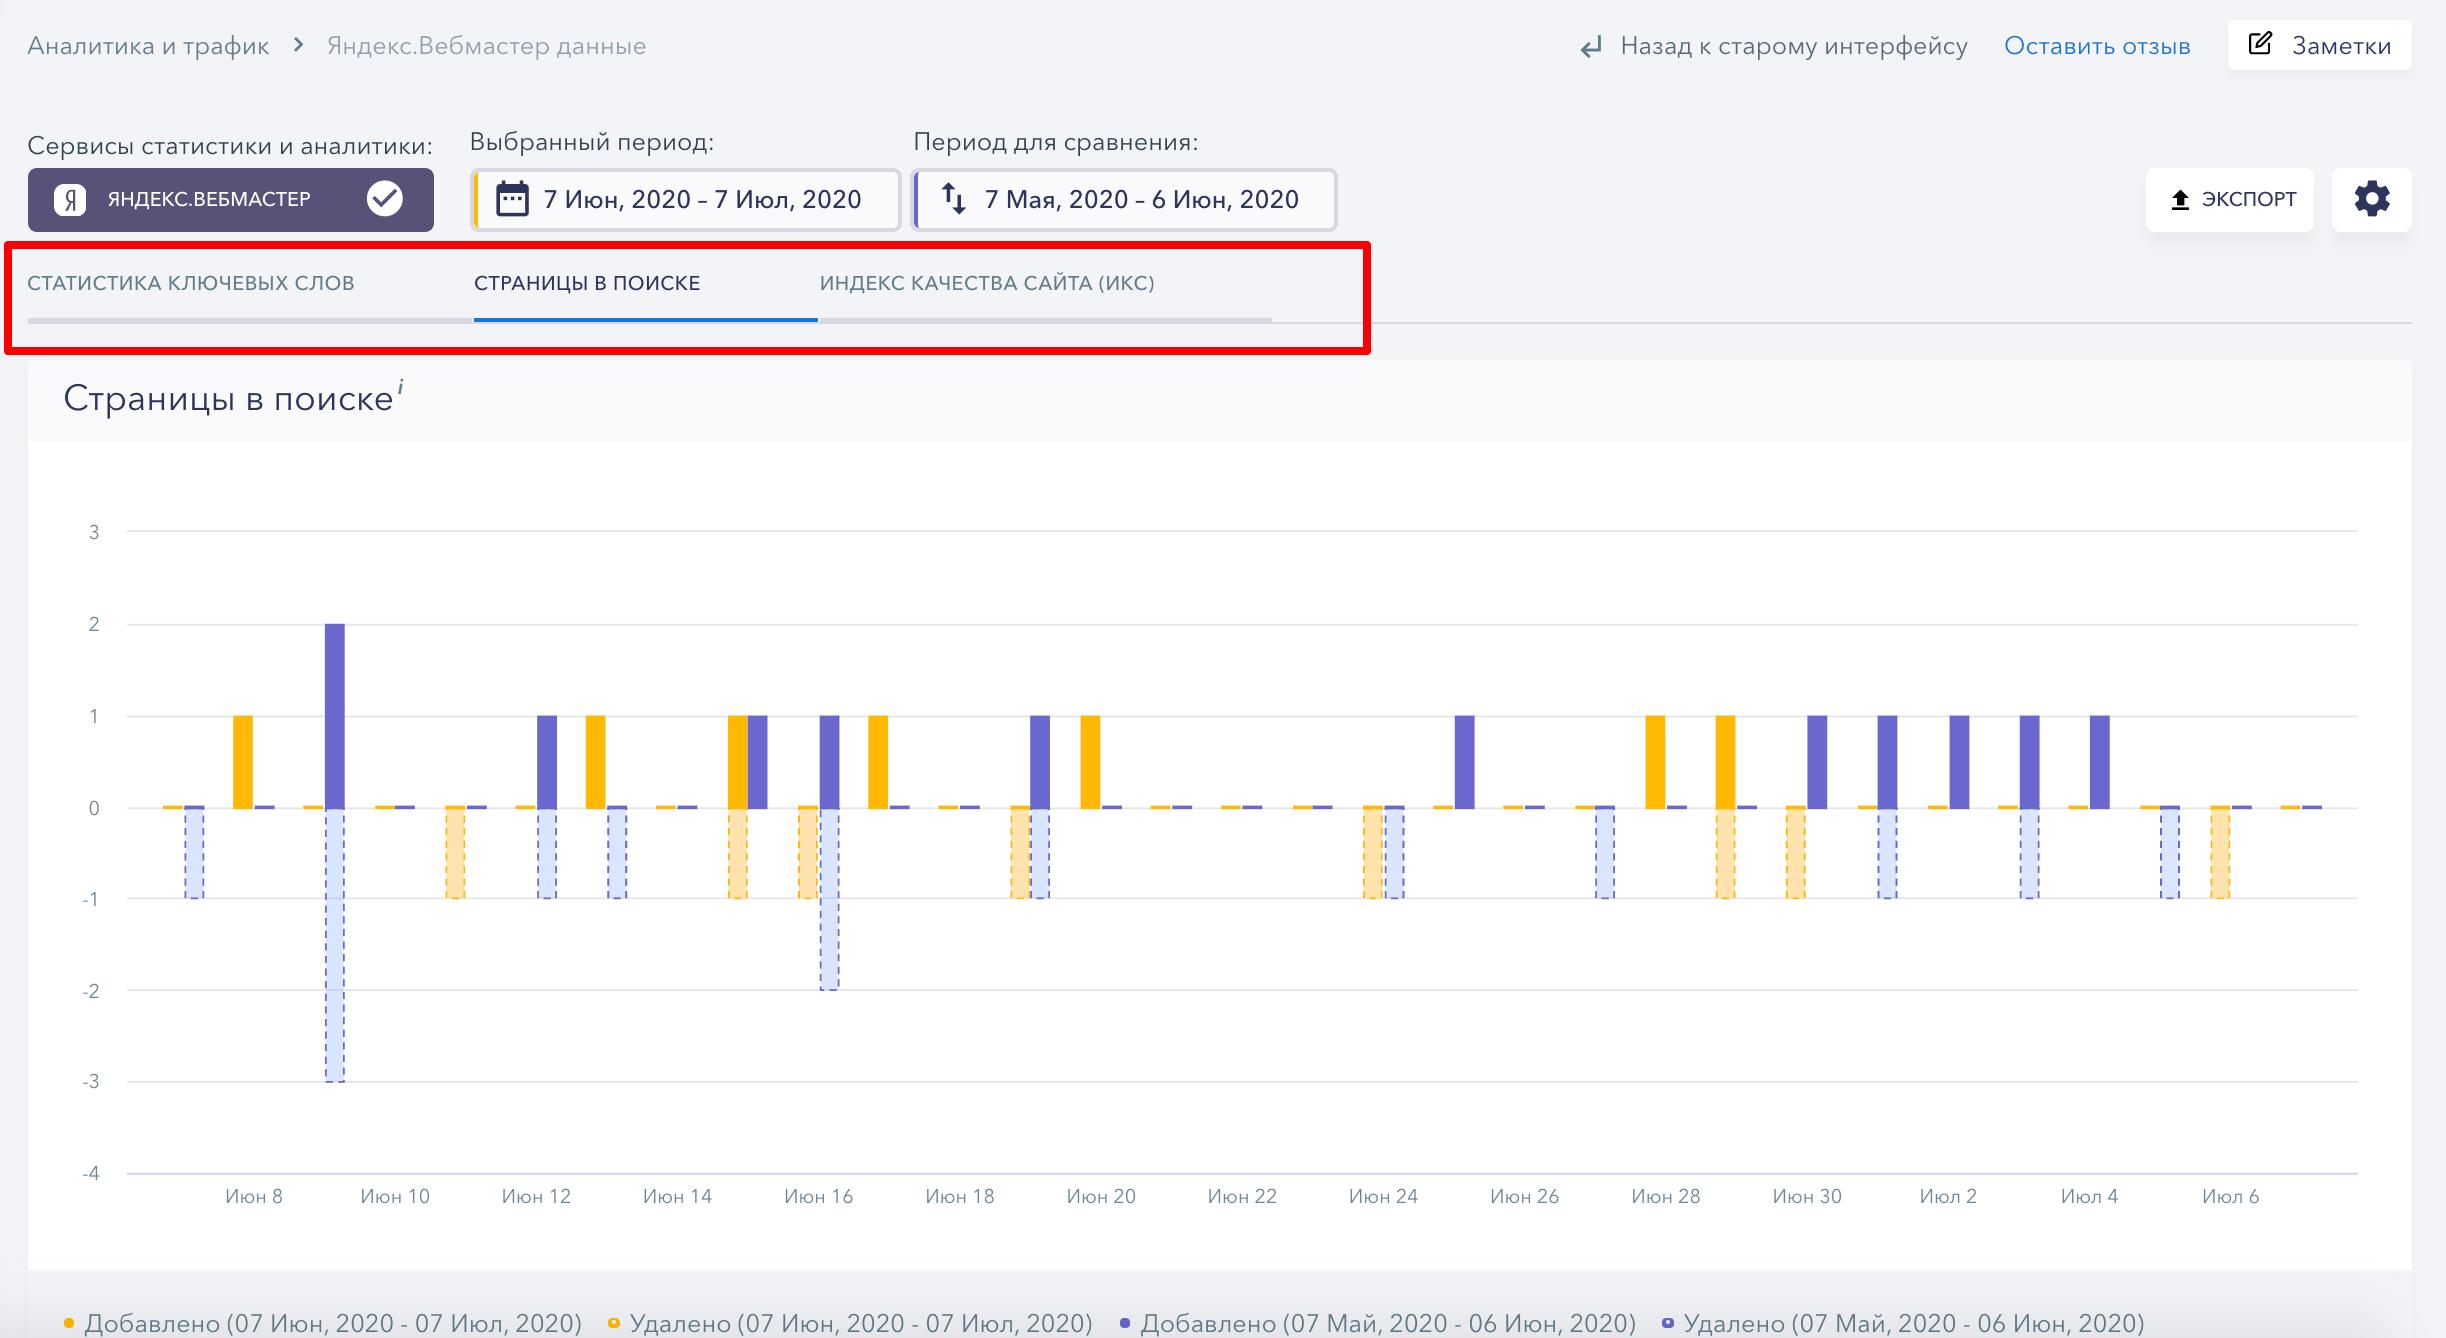 График динамики страниц в поиске Яндекса